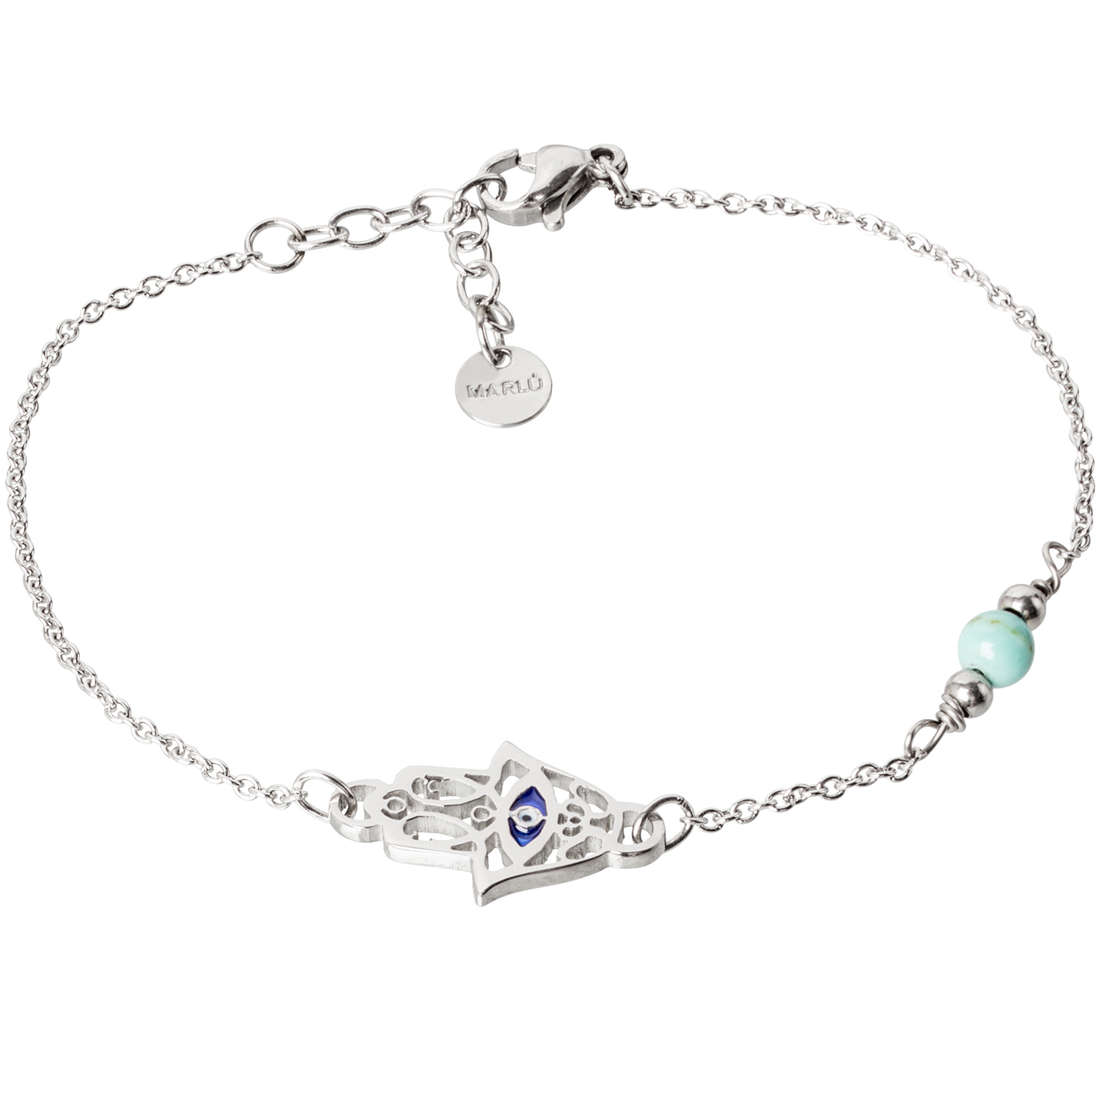 bracelet woman jewellery Marlù Segni 14BR097